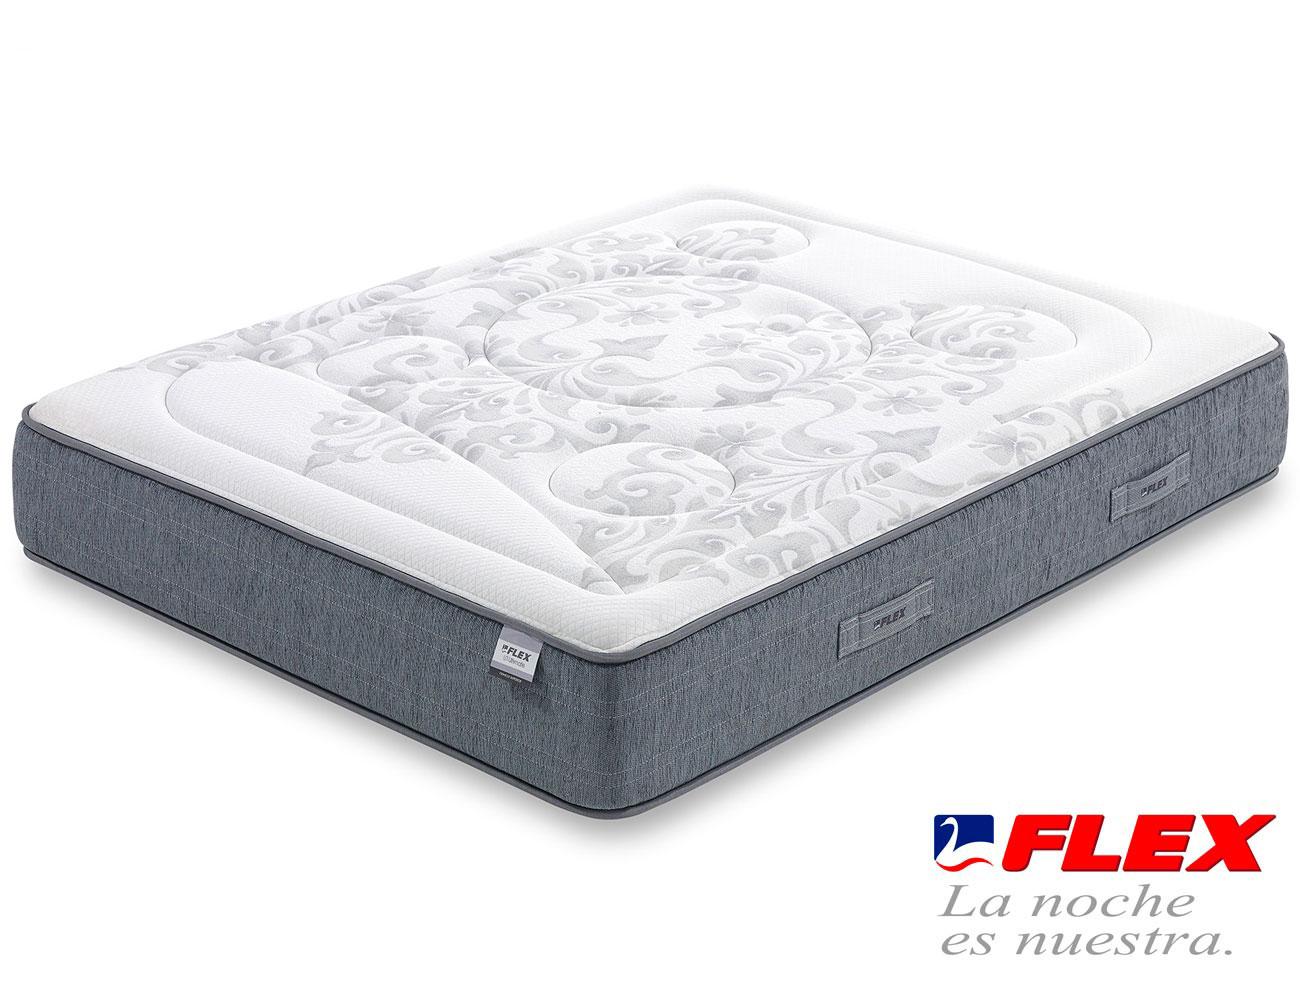 Colchon flex airvex viscoelastica gel garbi superior7